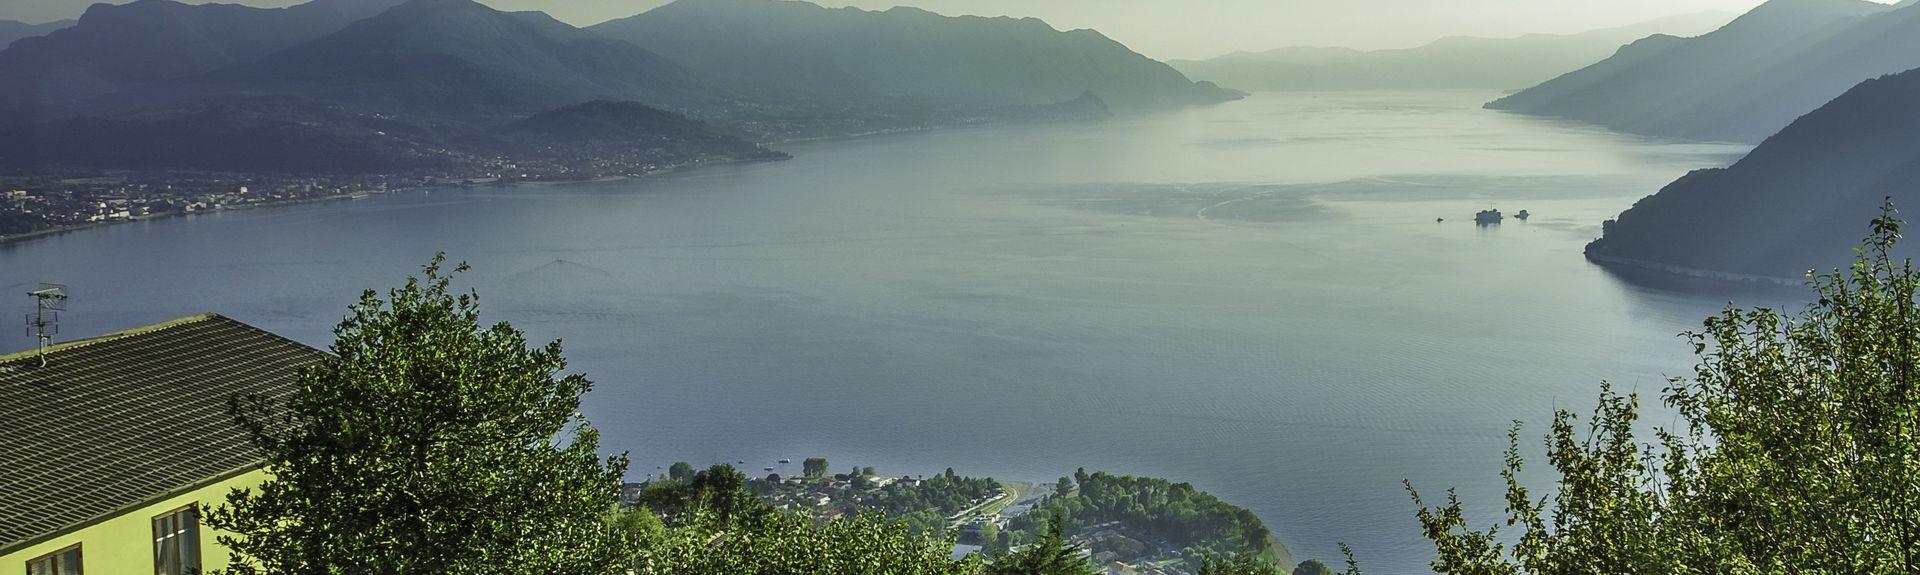 Cursolo-Orasso, Piemonte, Itália